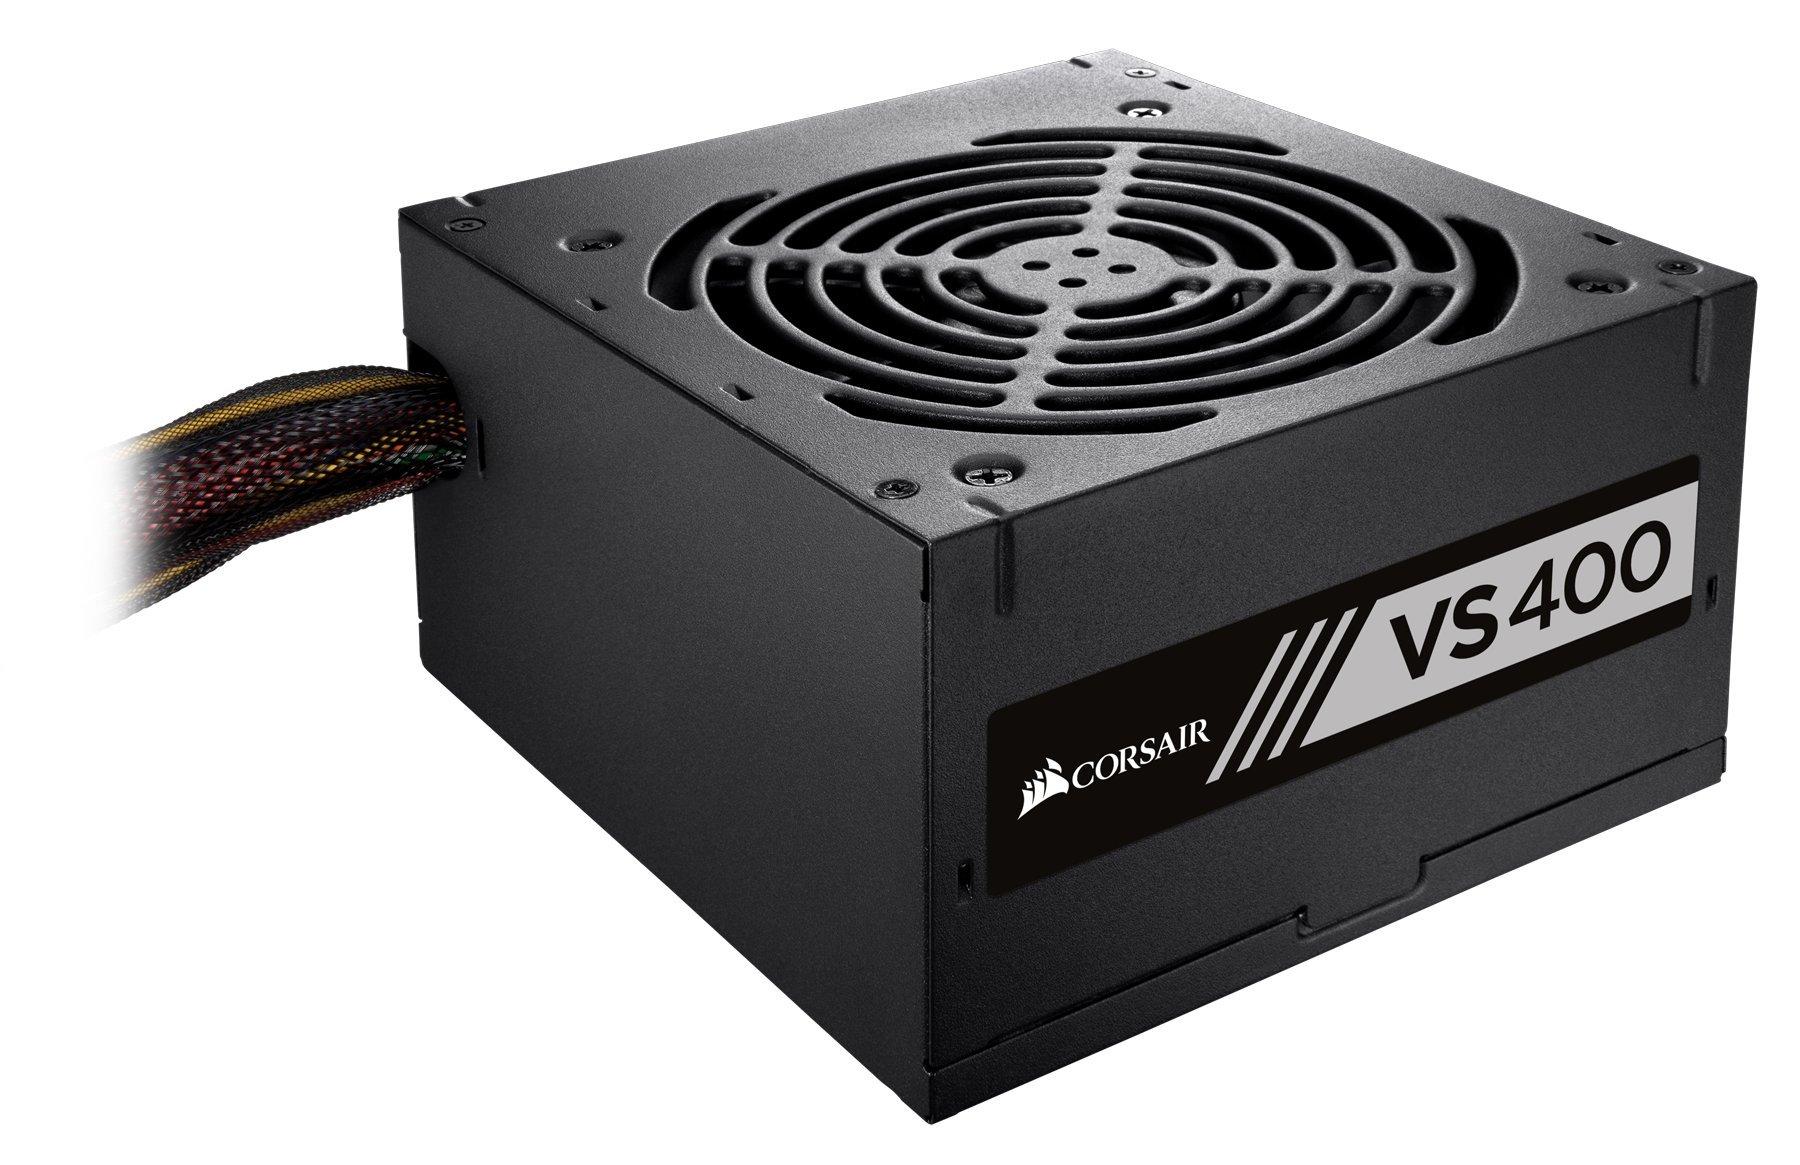 CORSAIR VS Series, VS400, 400 Watt, Active PFC Power Supply, 80+ White Certified